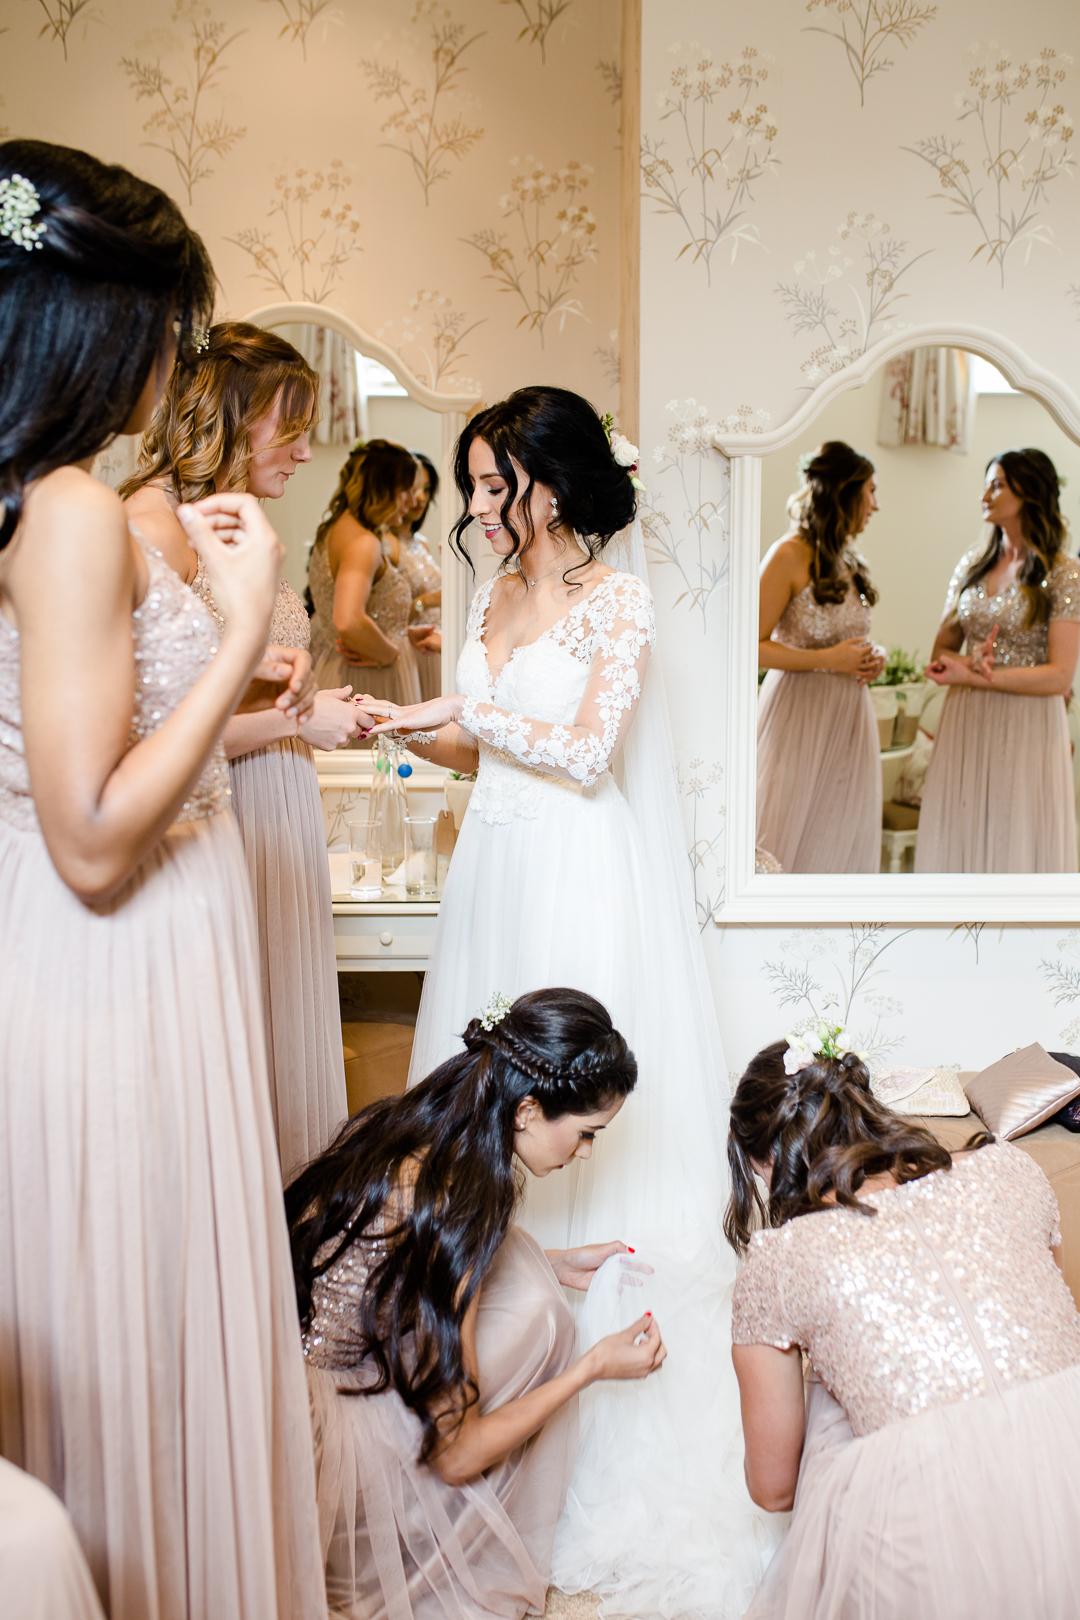 Bride and bridesmaids getting ready for wedding at Clock Barn Hampshire